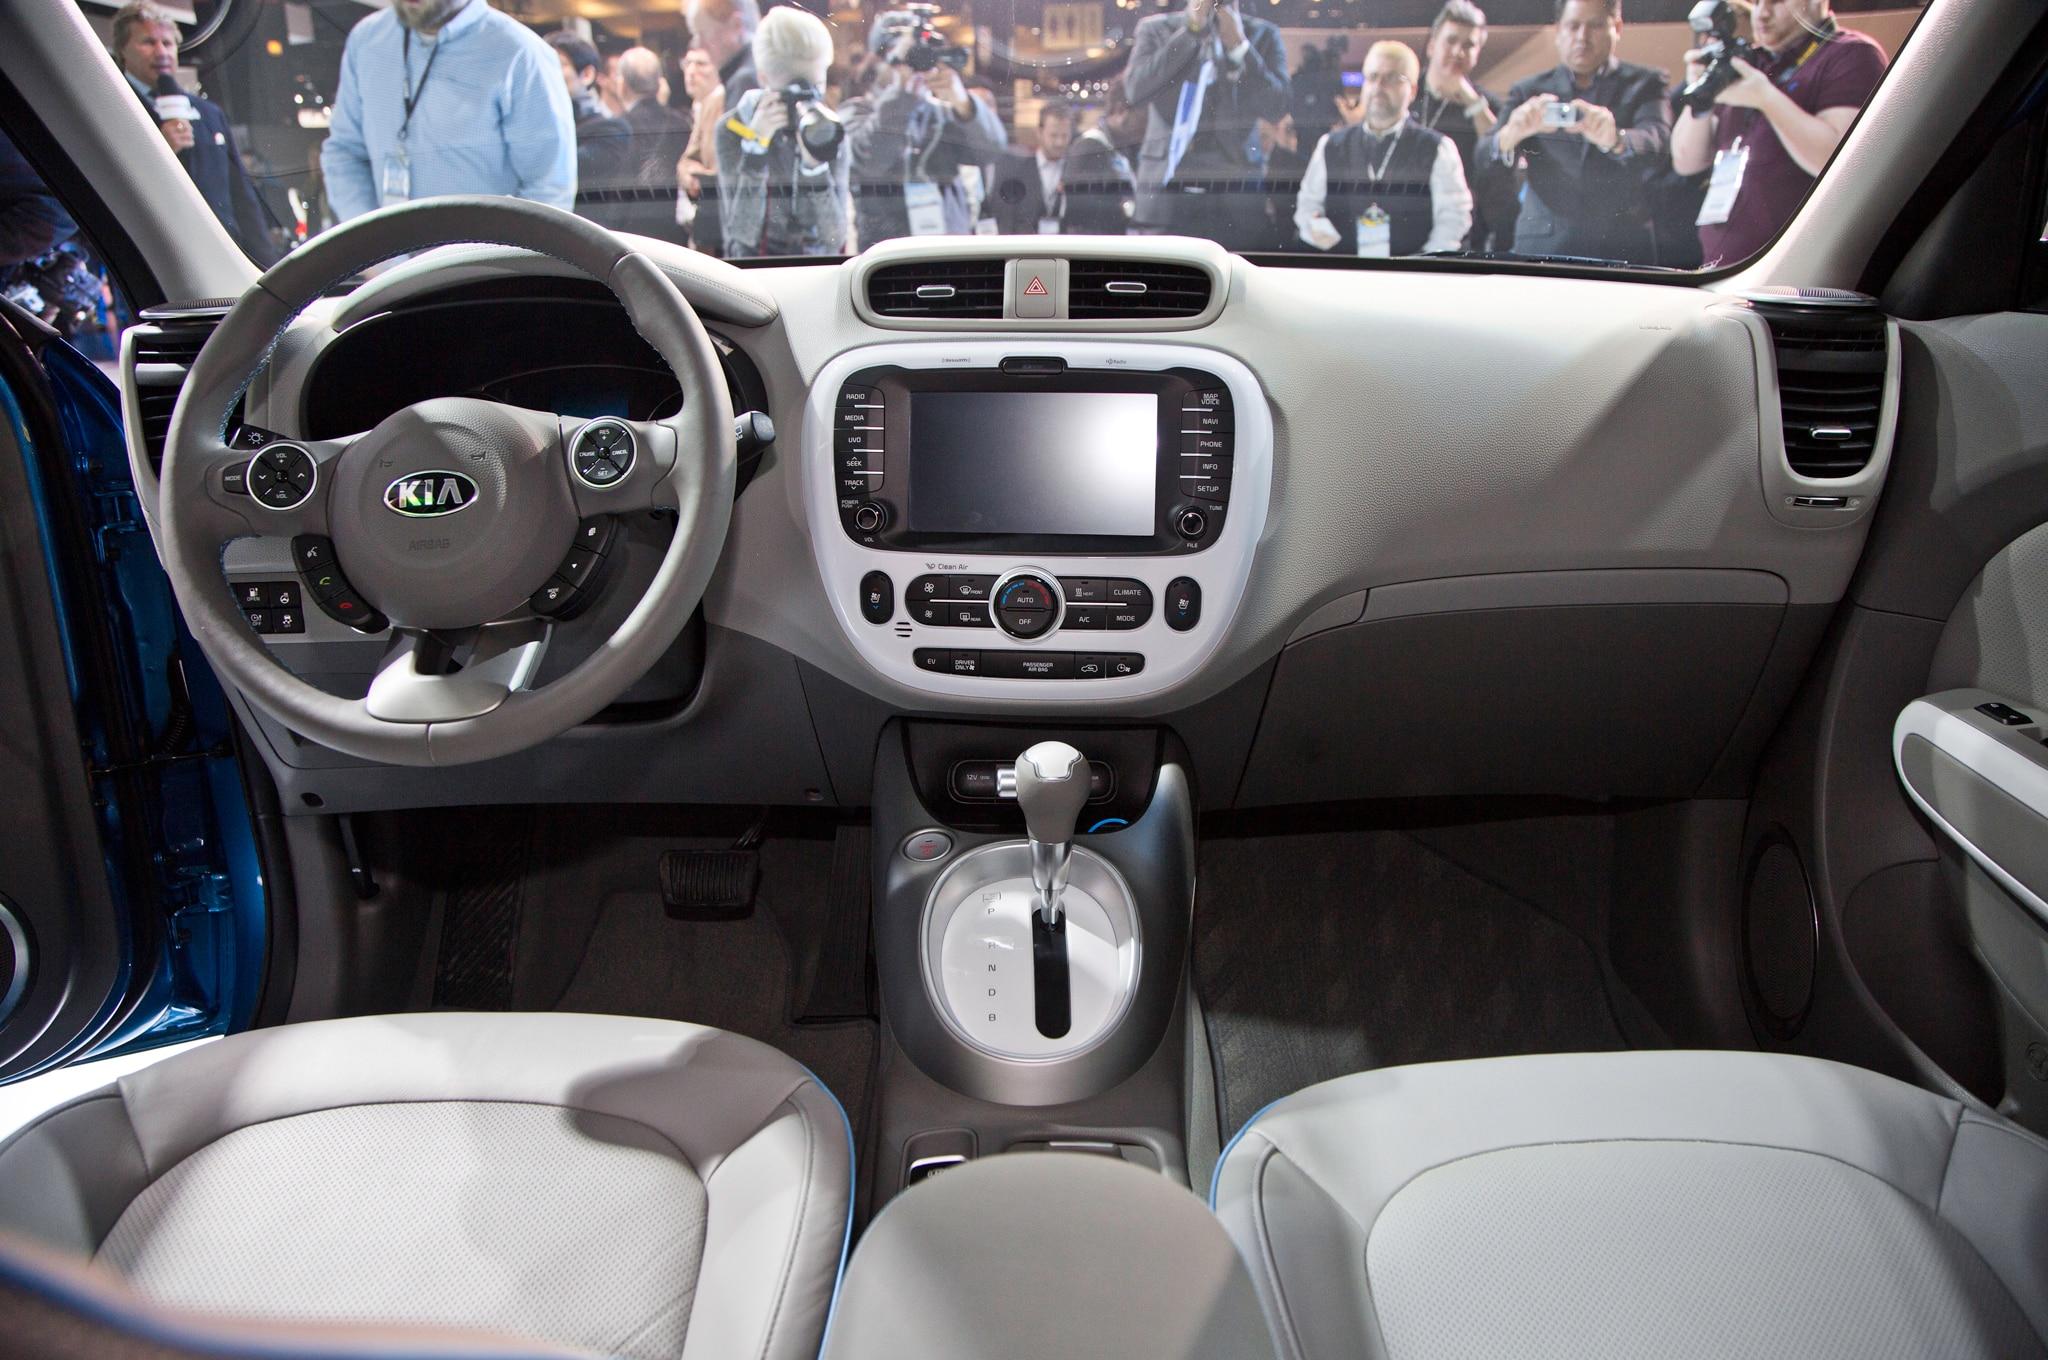 2015 Kia Soul EV Revealed at 2014 Chicago Auto Show  Automobile